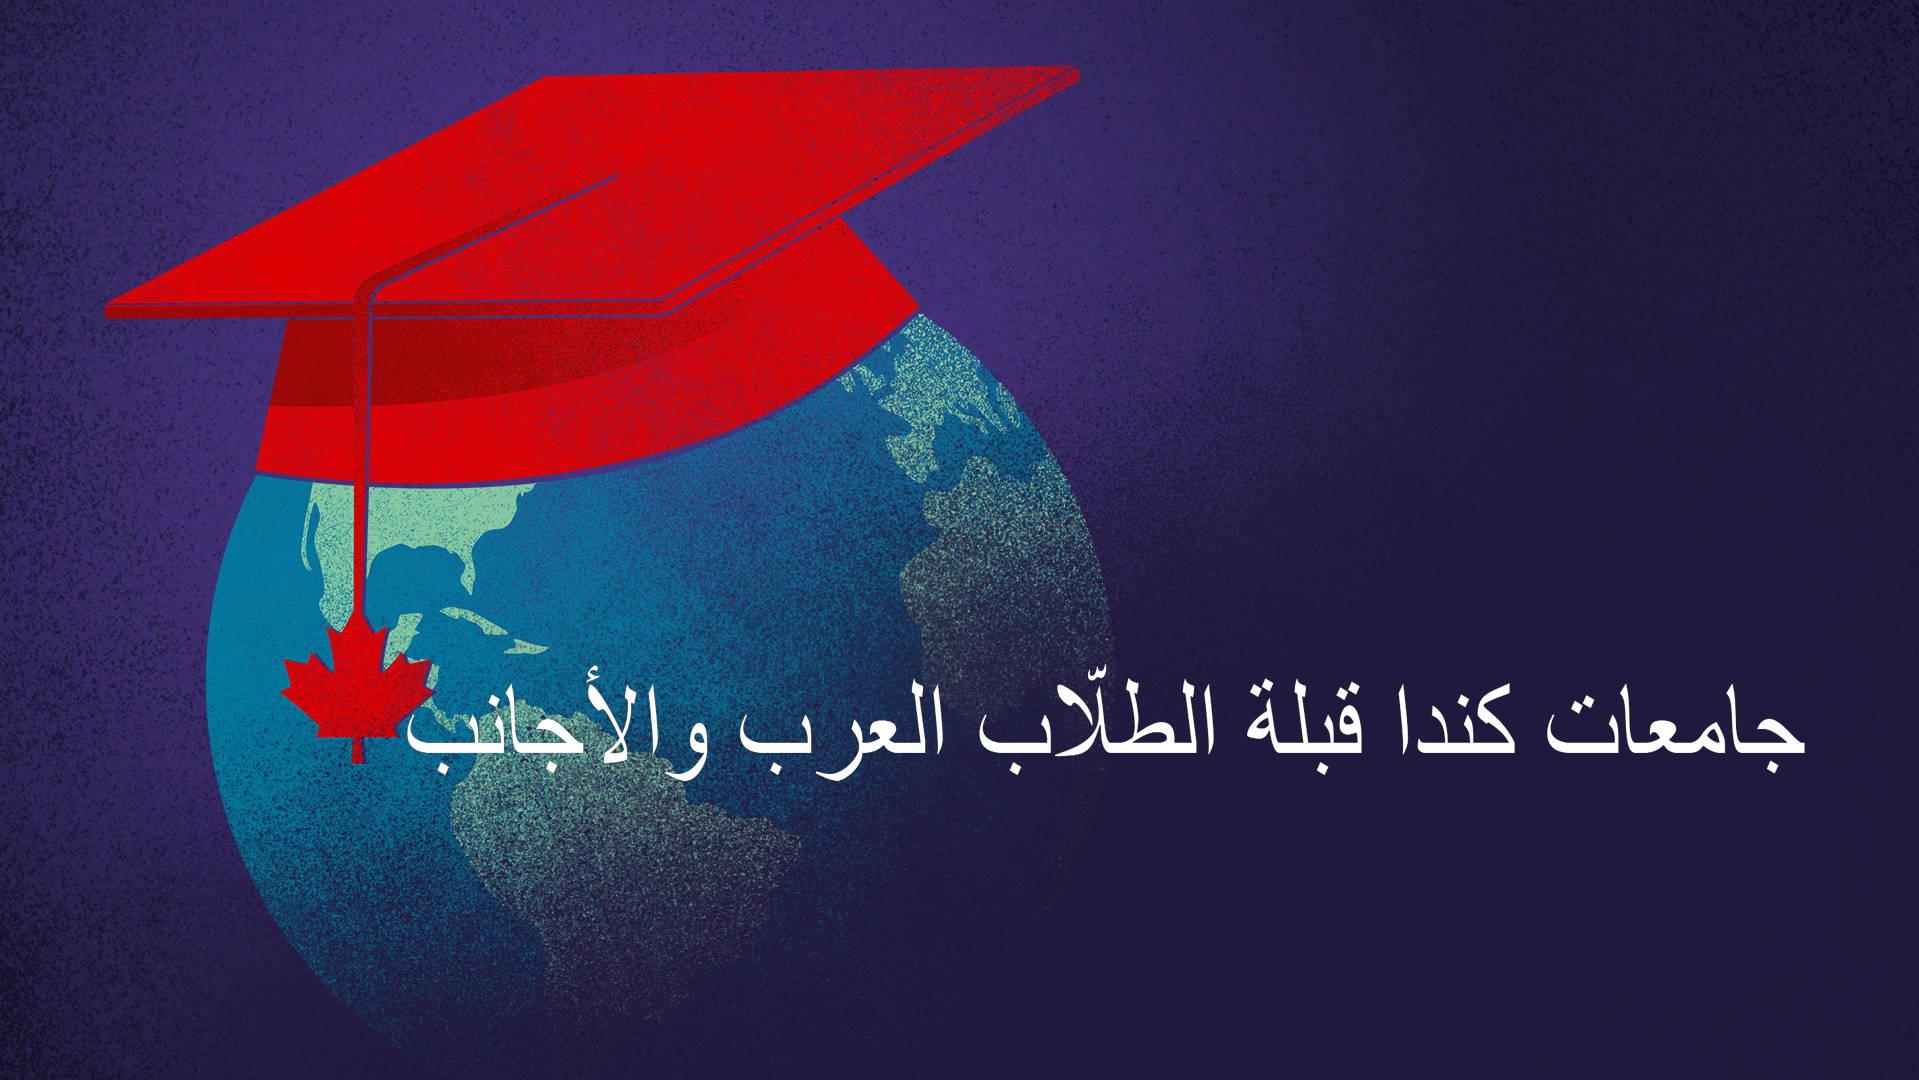 le texte «جامعات كندا قبلة الطلّاب العرب والأجانب» en blanc avec comme fond un globe terrestre avec un chapeau de finissant